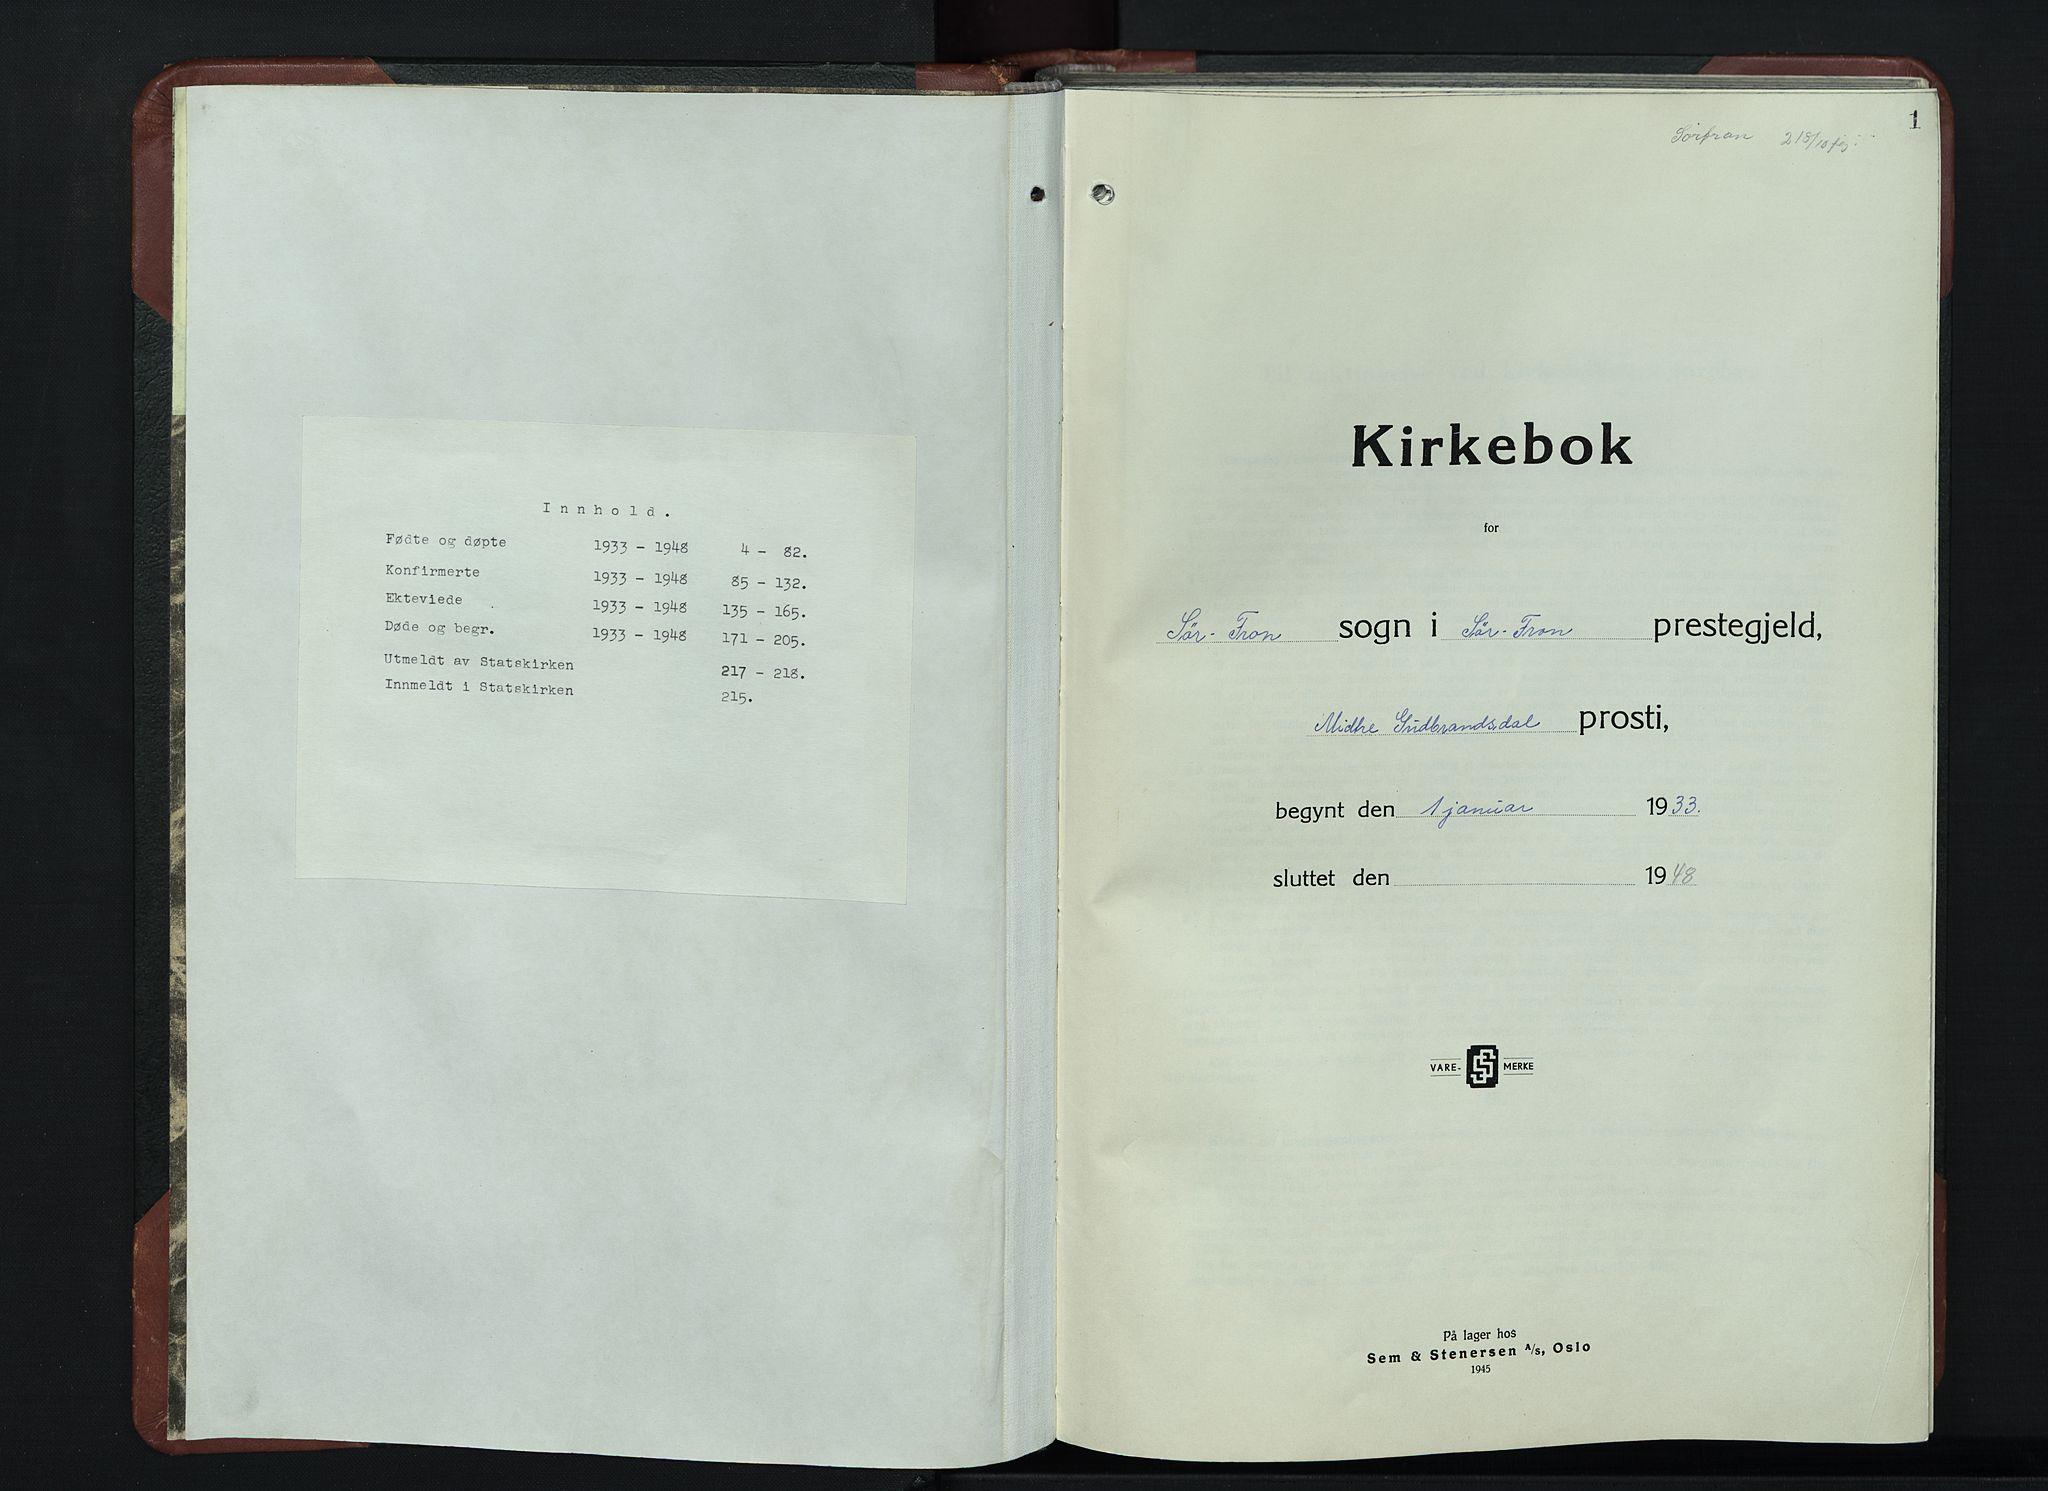 SAH, Sør-Fron prestekontor, H/Ha/Hab/L0006: Klokkerbok nr. 6, 1933-1948, s. 1